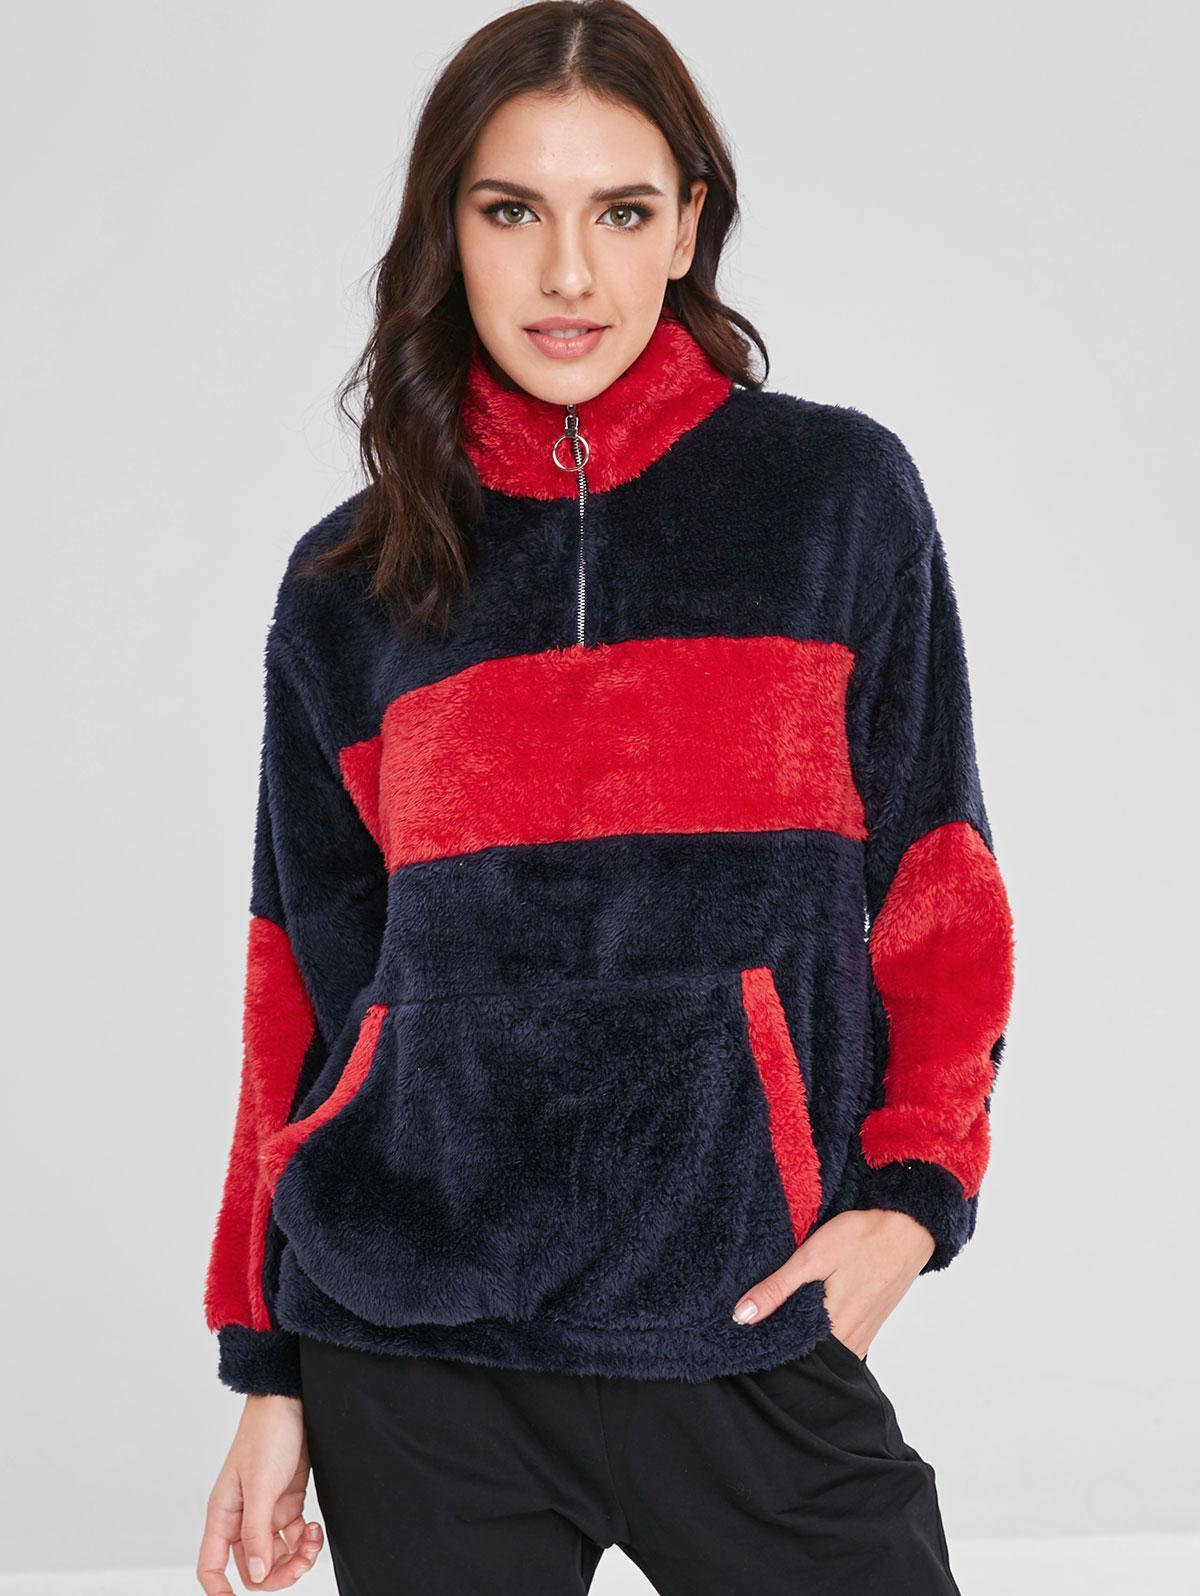 ZAFUL Kangaroo Pocket Two Tone Fluffy Sweatshirt, Dark slate blue